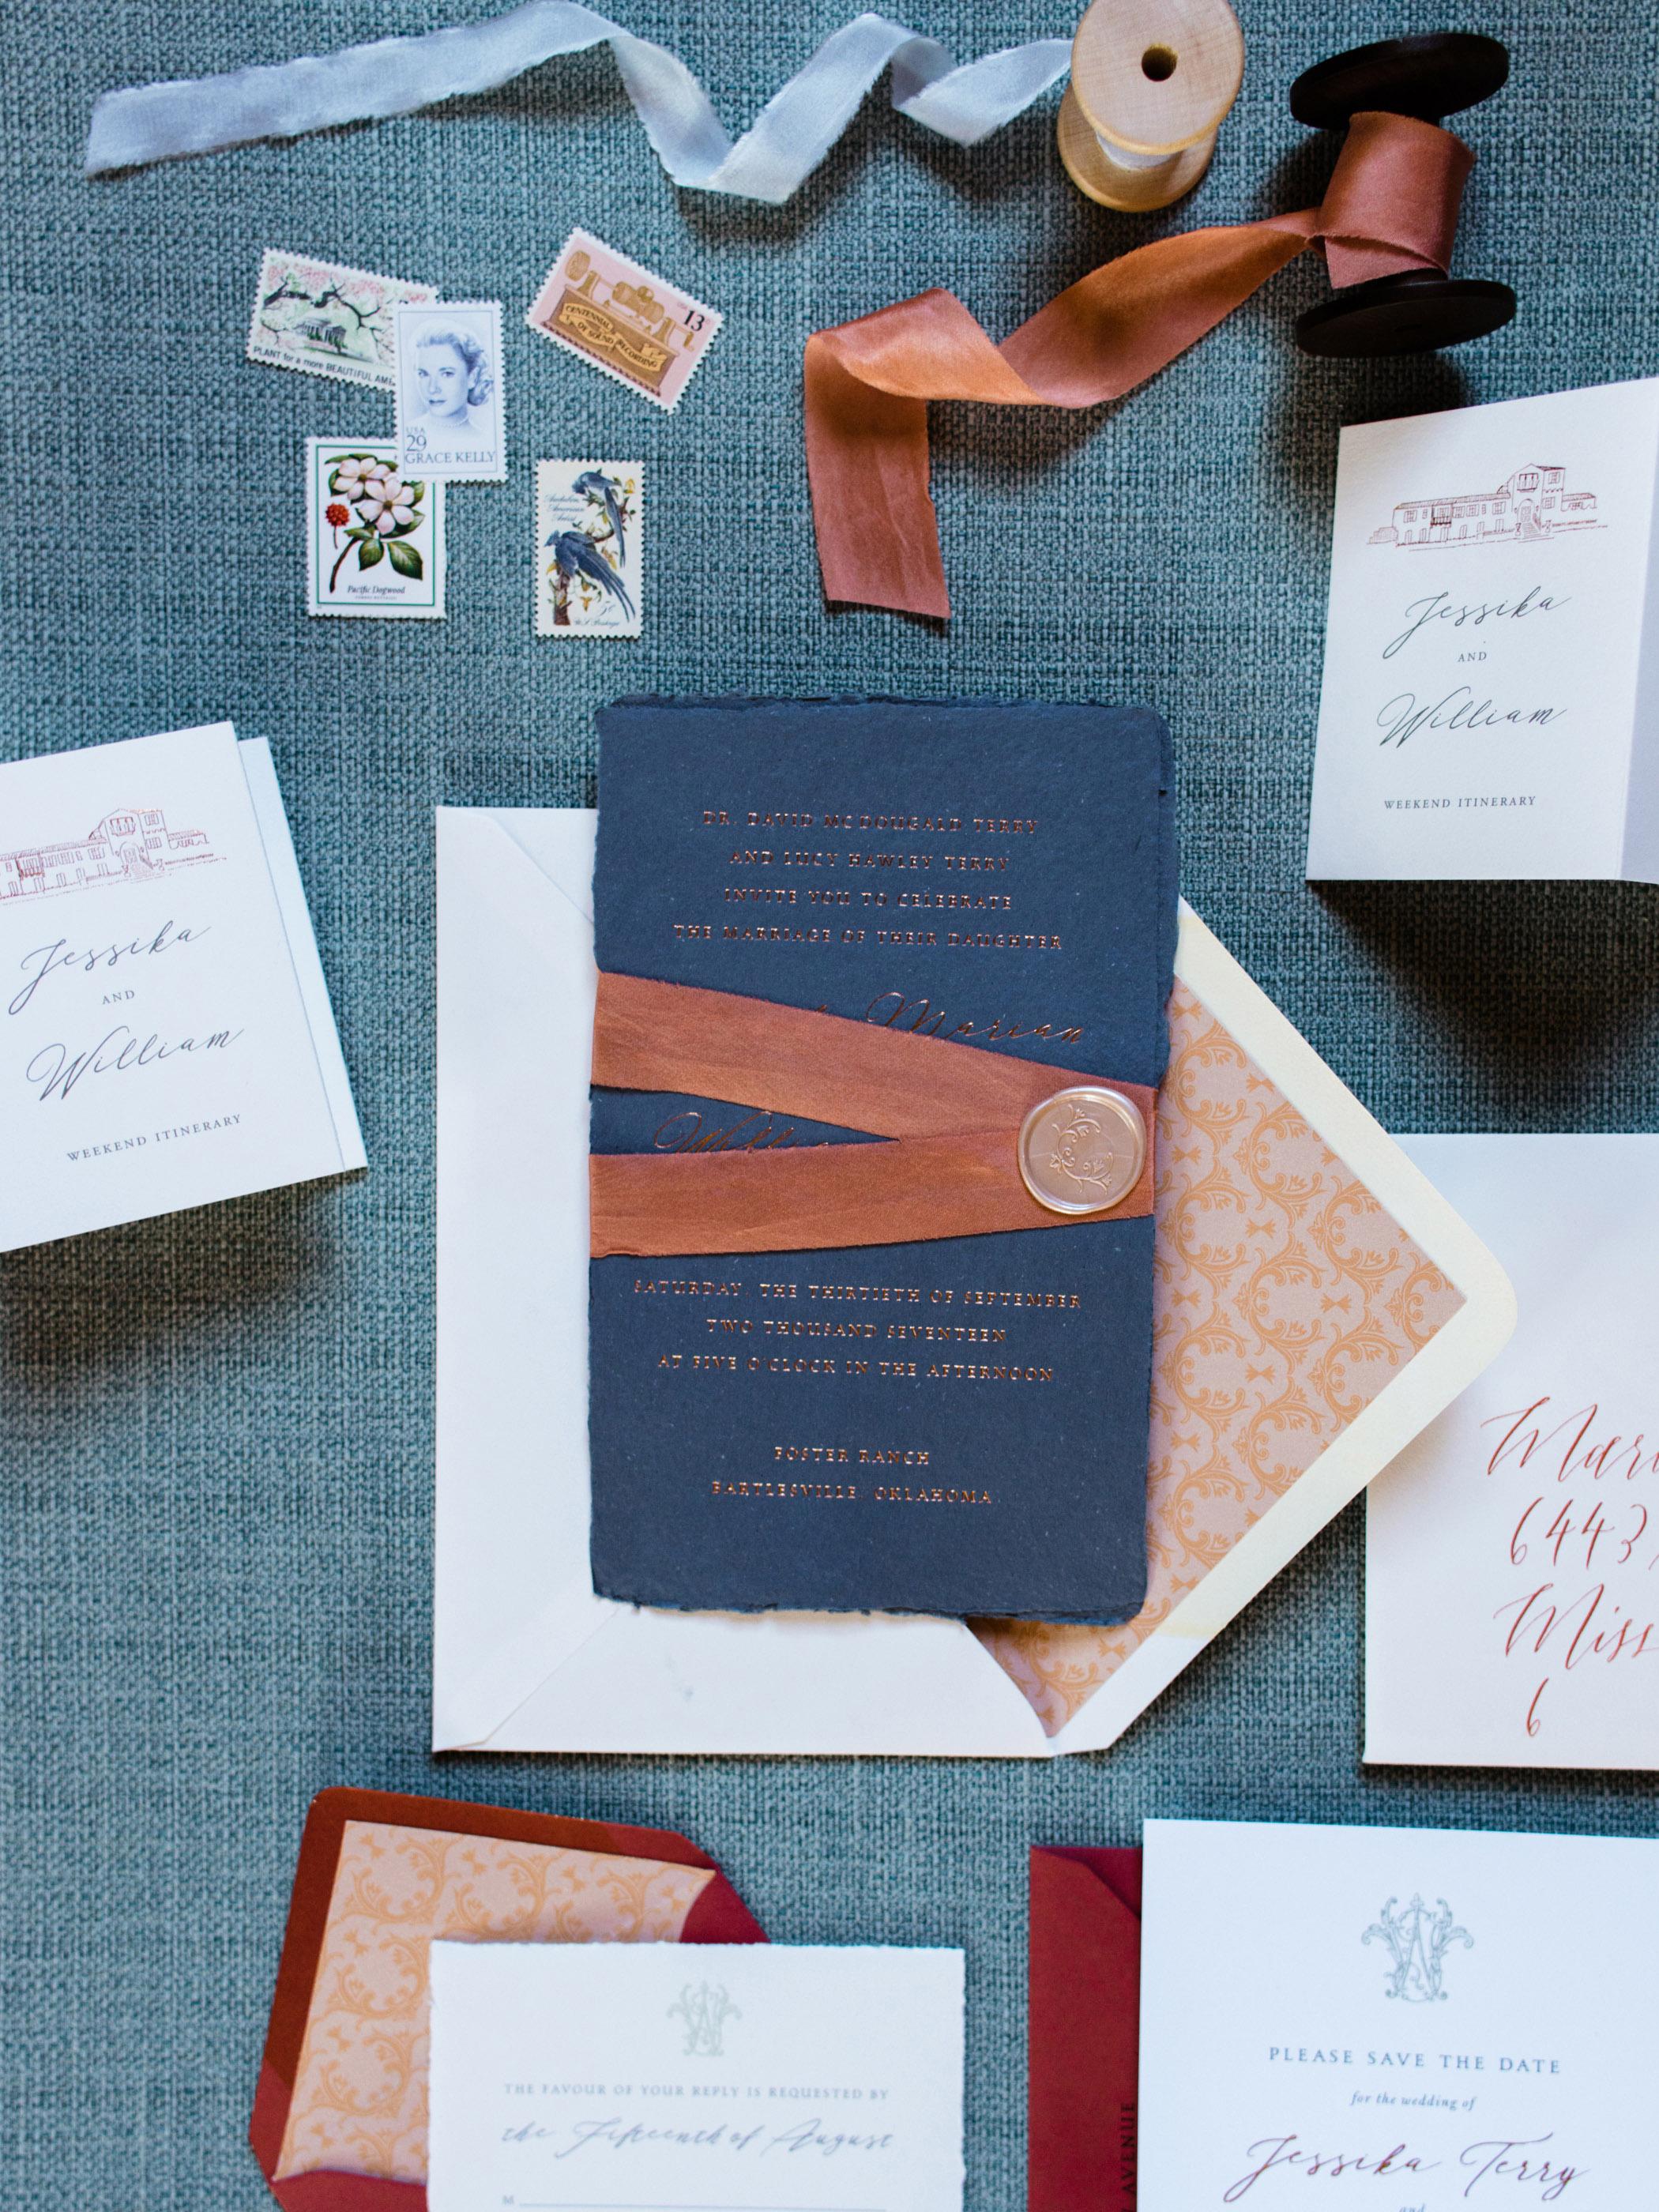 jessika william wedding invitations